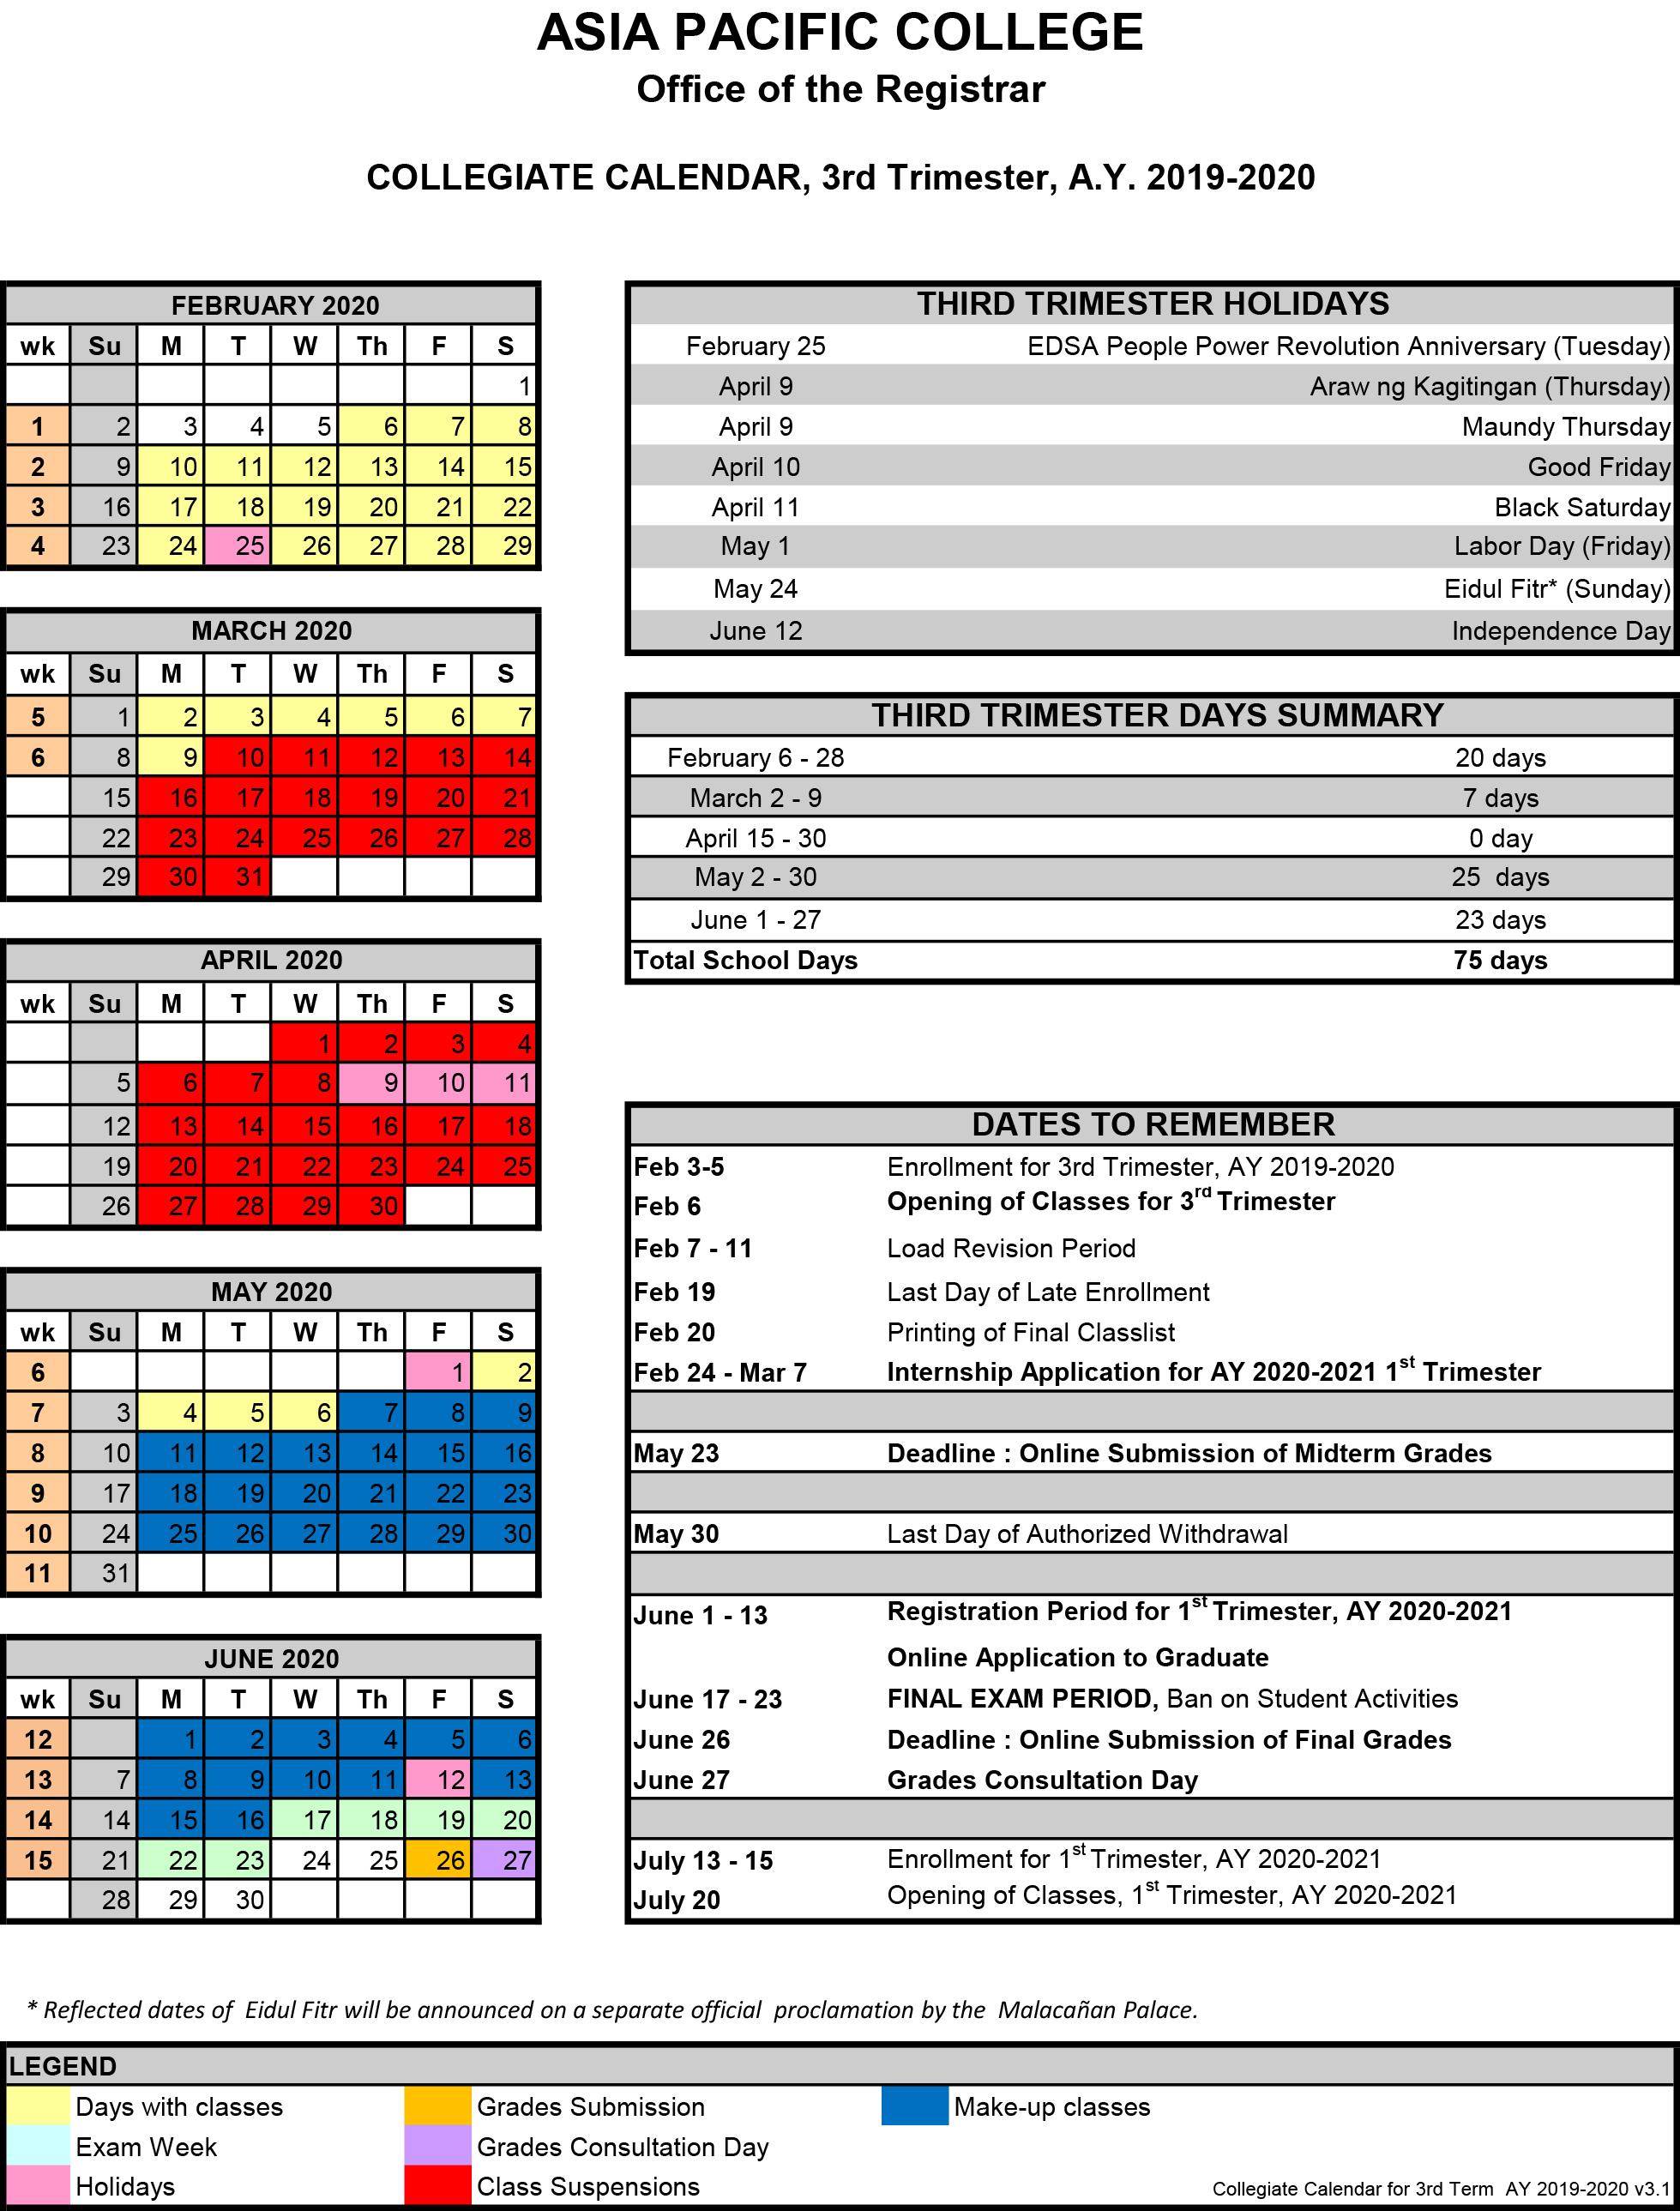 Term 3 Collegiate Calendar_as of 04-20-2020